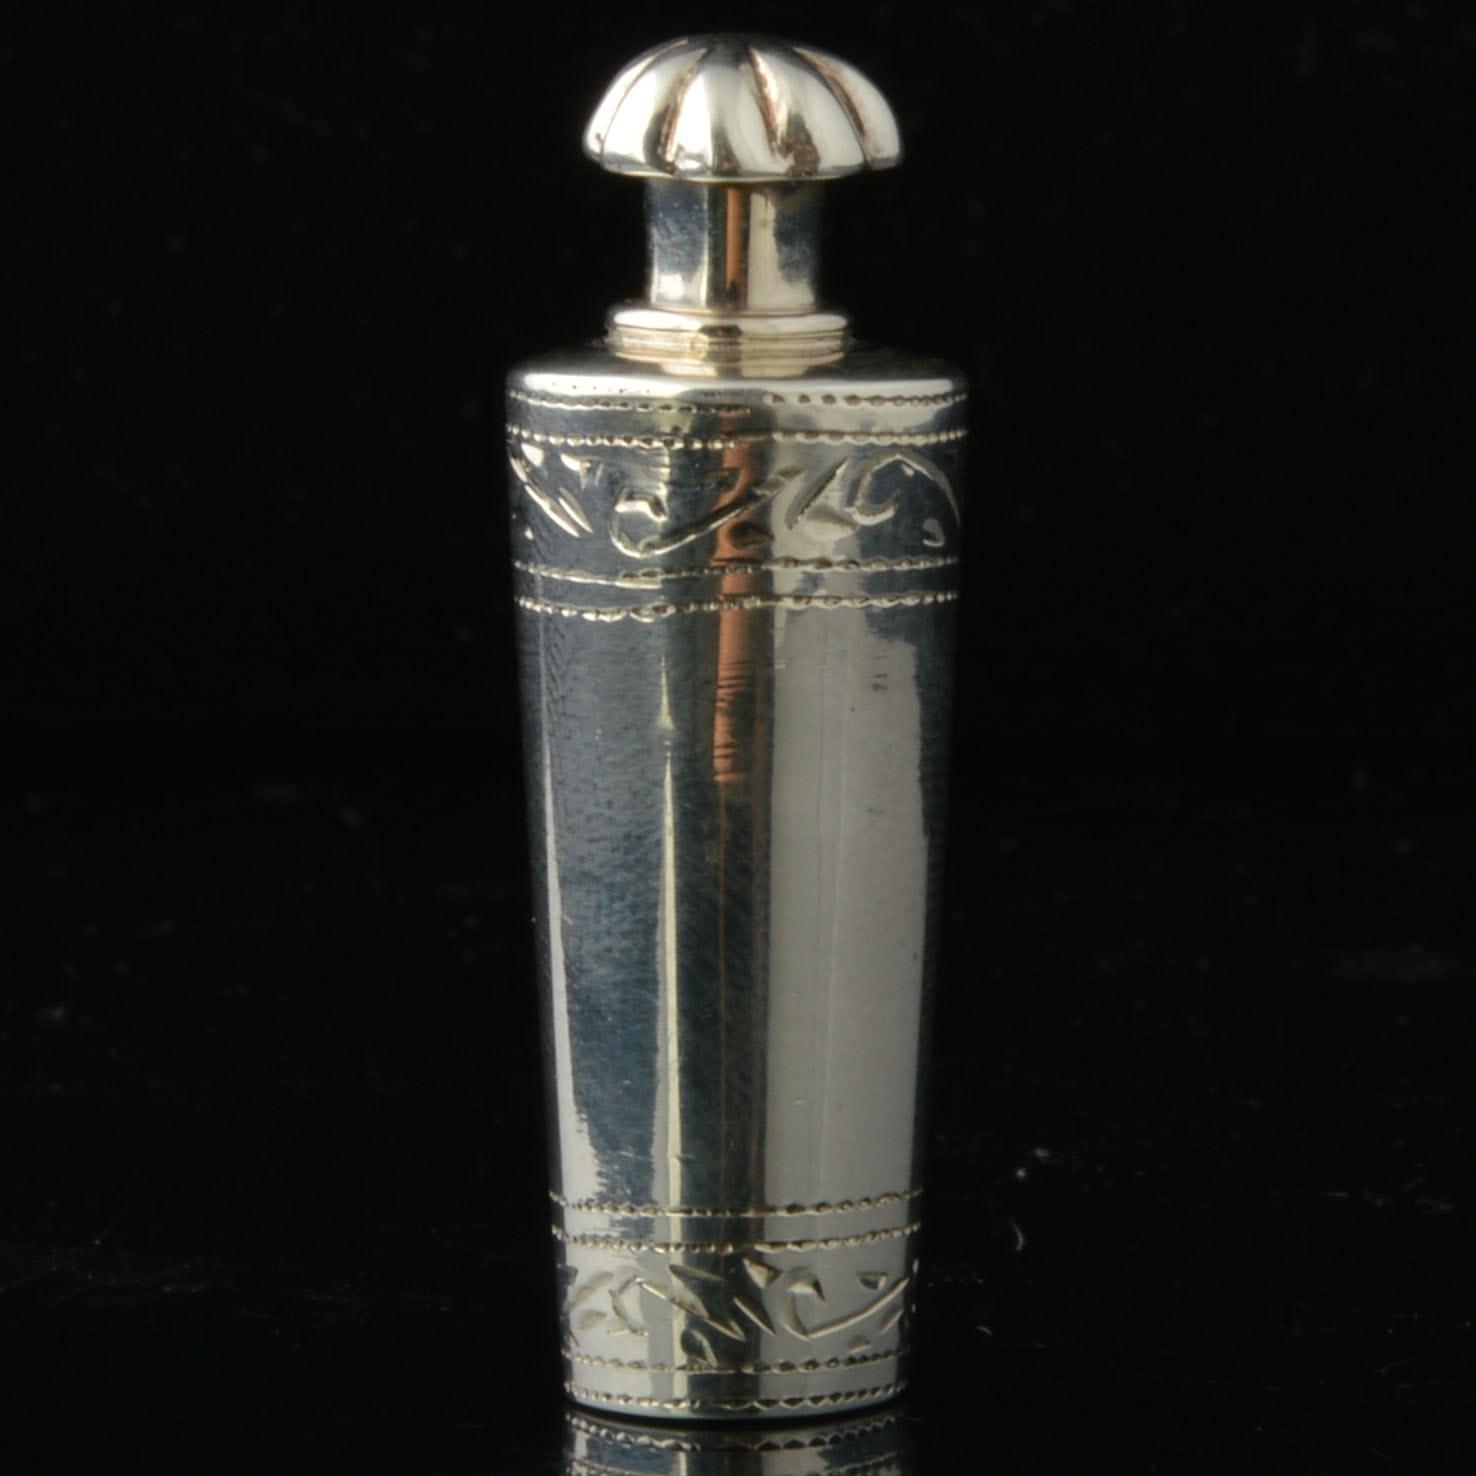 Sterling Perfume Bottle